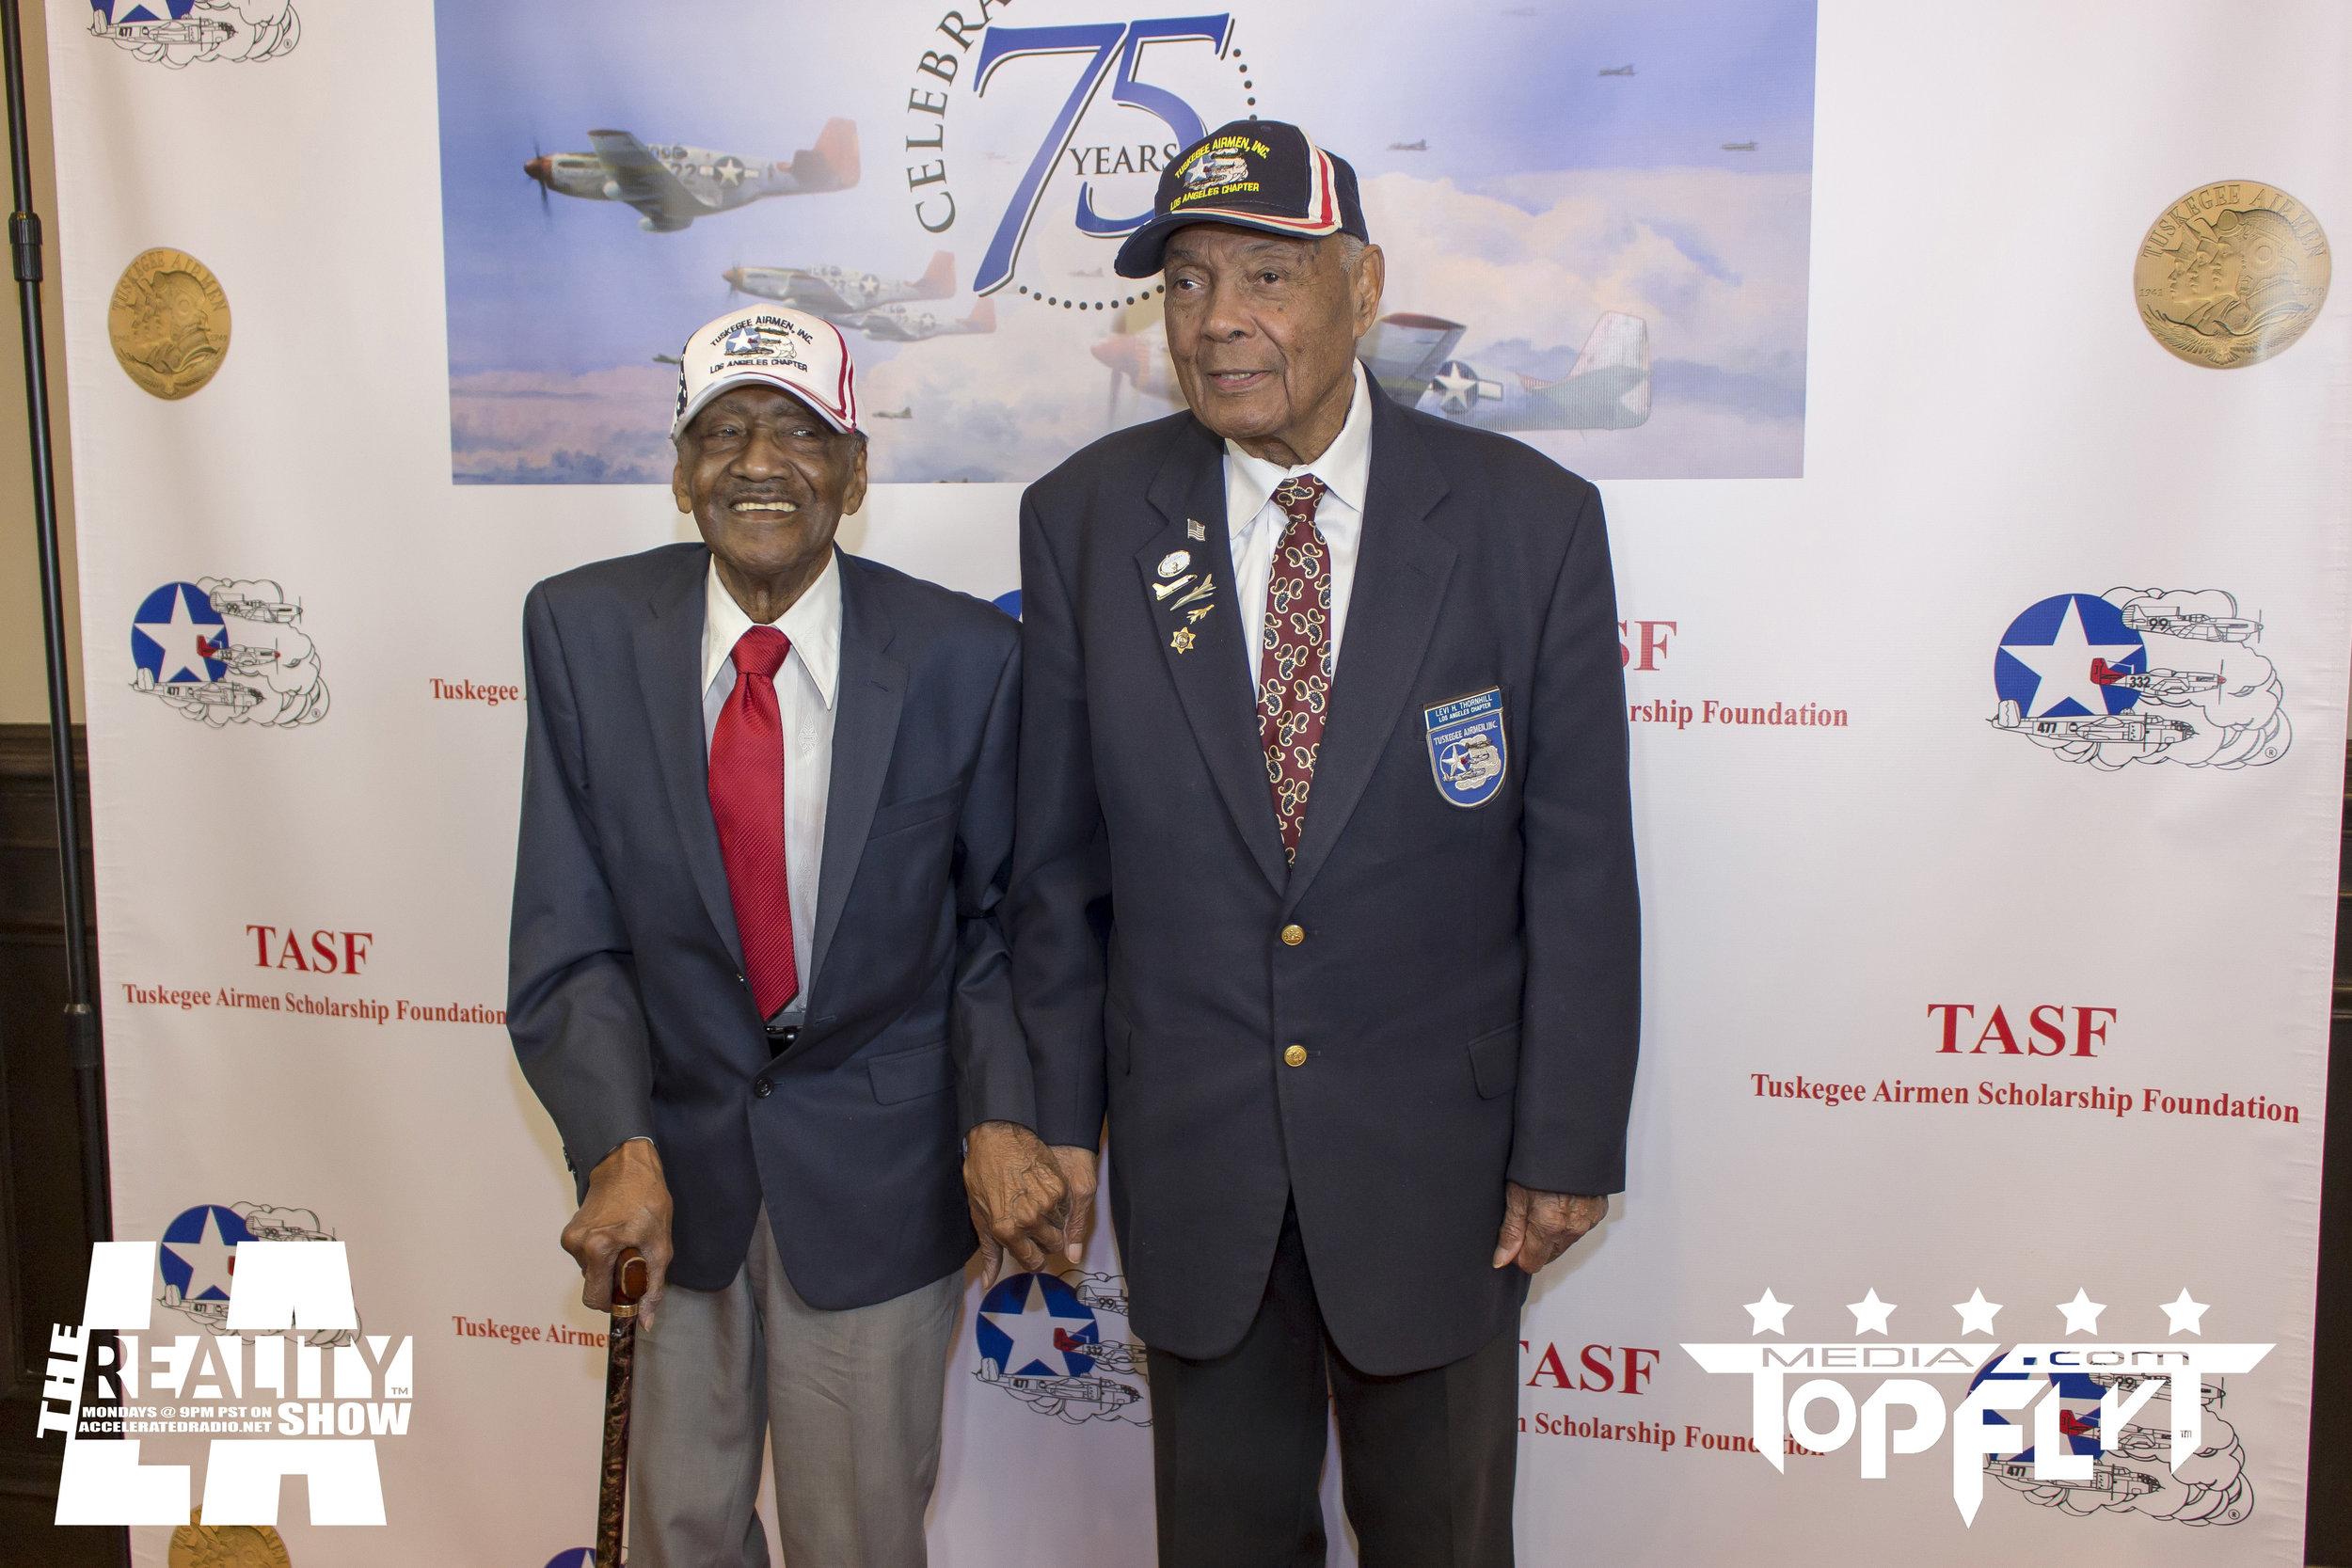 The Reality Show LA - Tuskegee Airmen 75th Anniversary VIP Reception_19.jpg